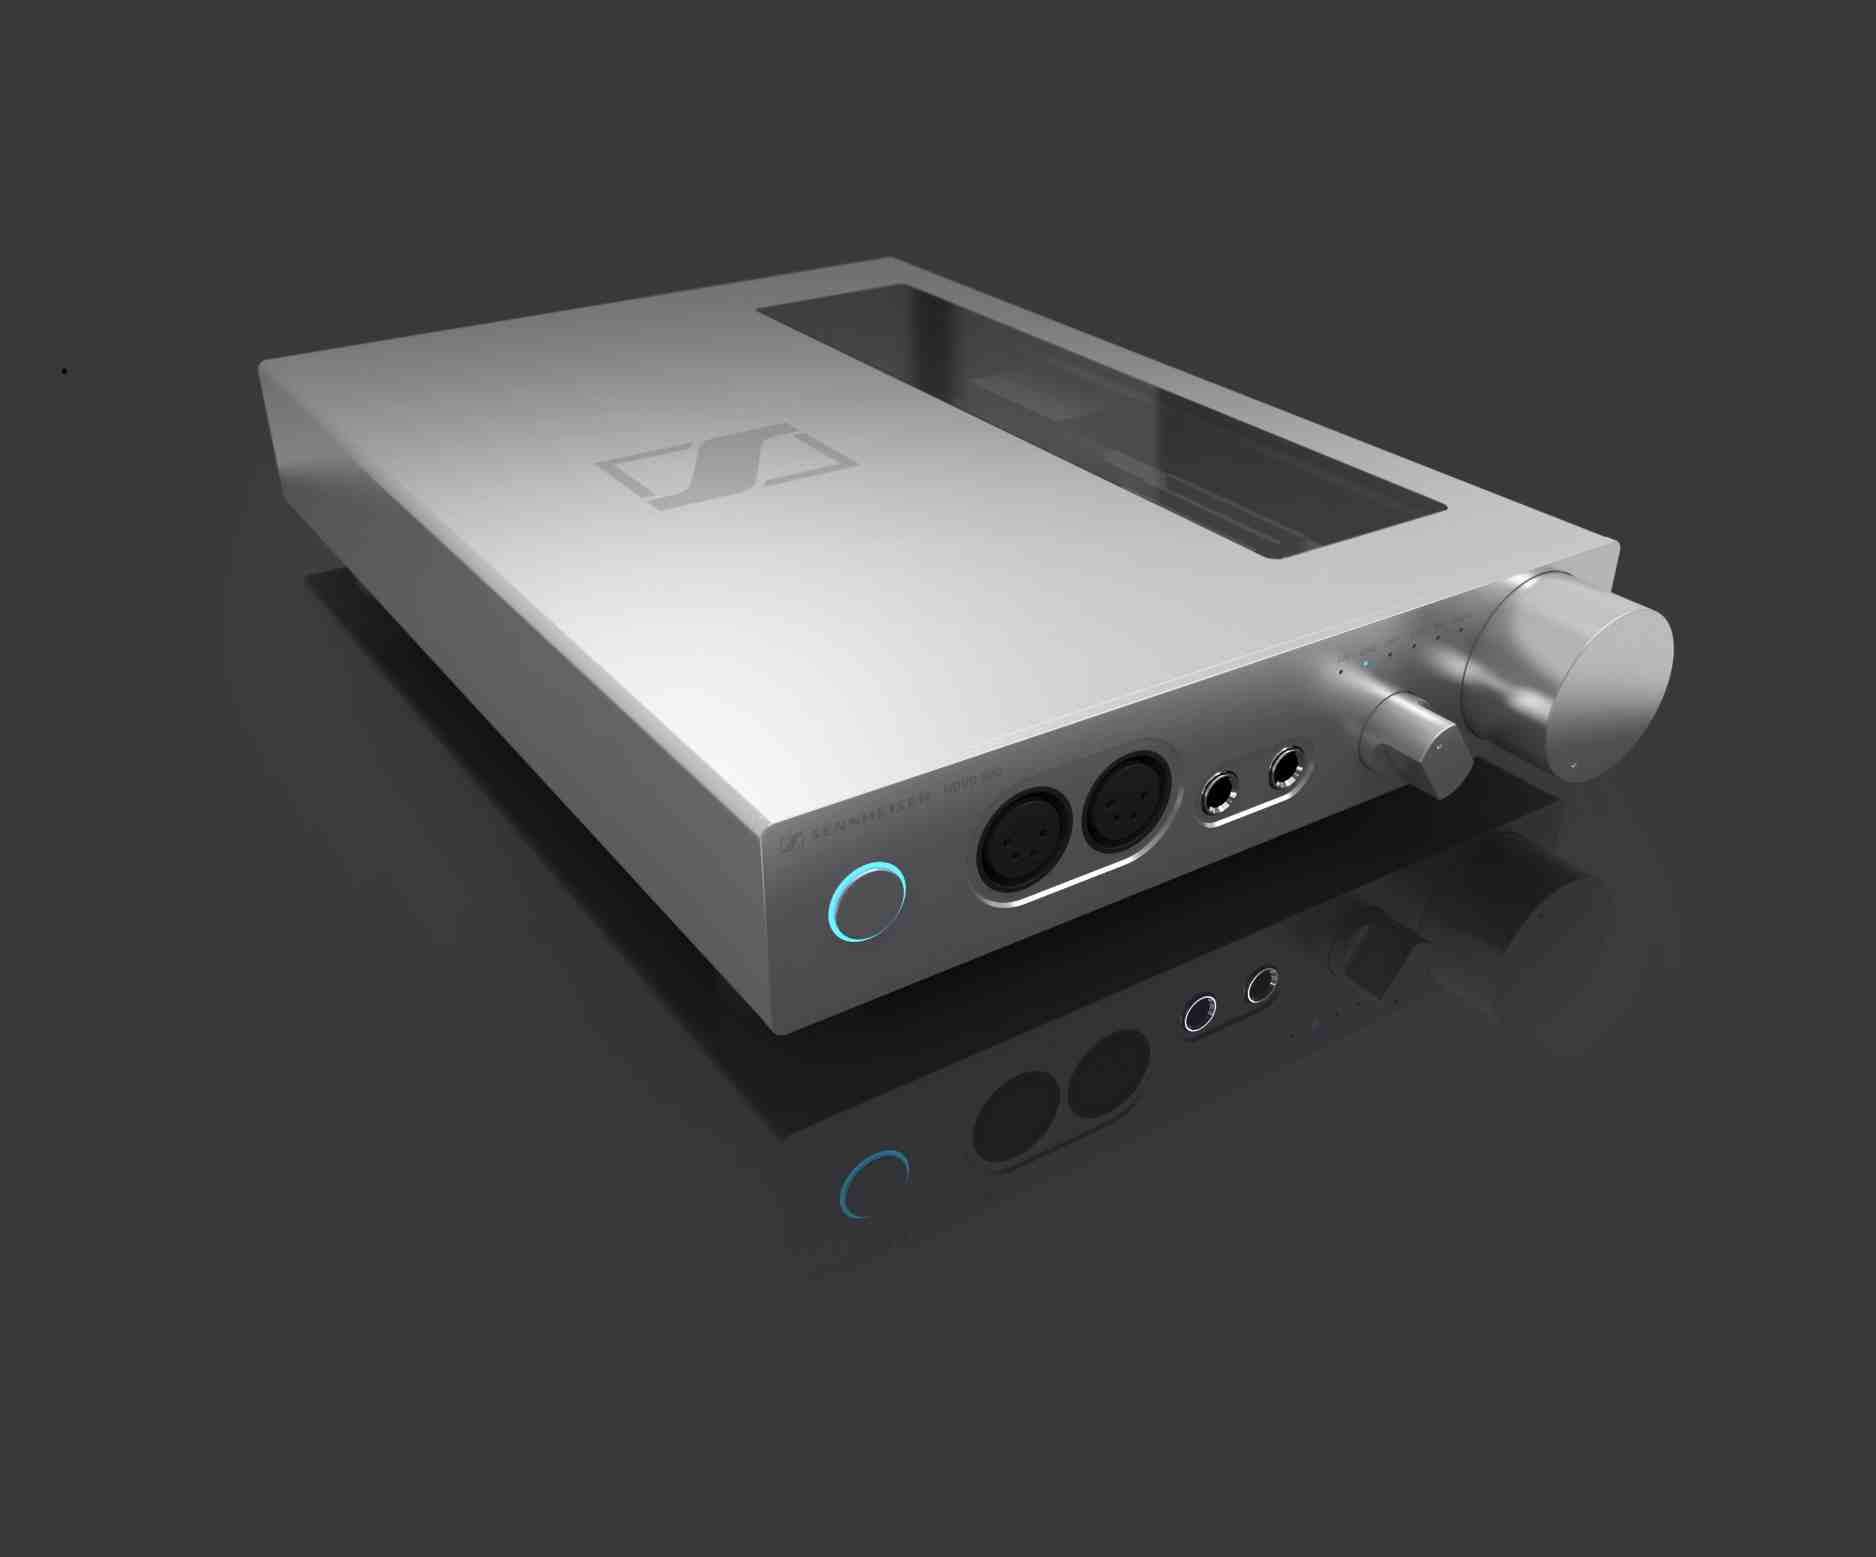 Sennheiser Presents Its Digital Headphone Amplifier Audioreview Hd 800 Dynamic Stereo